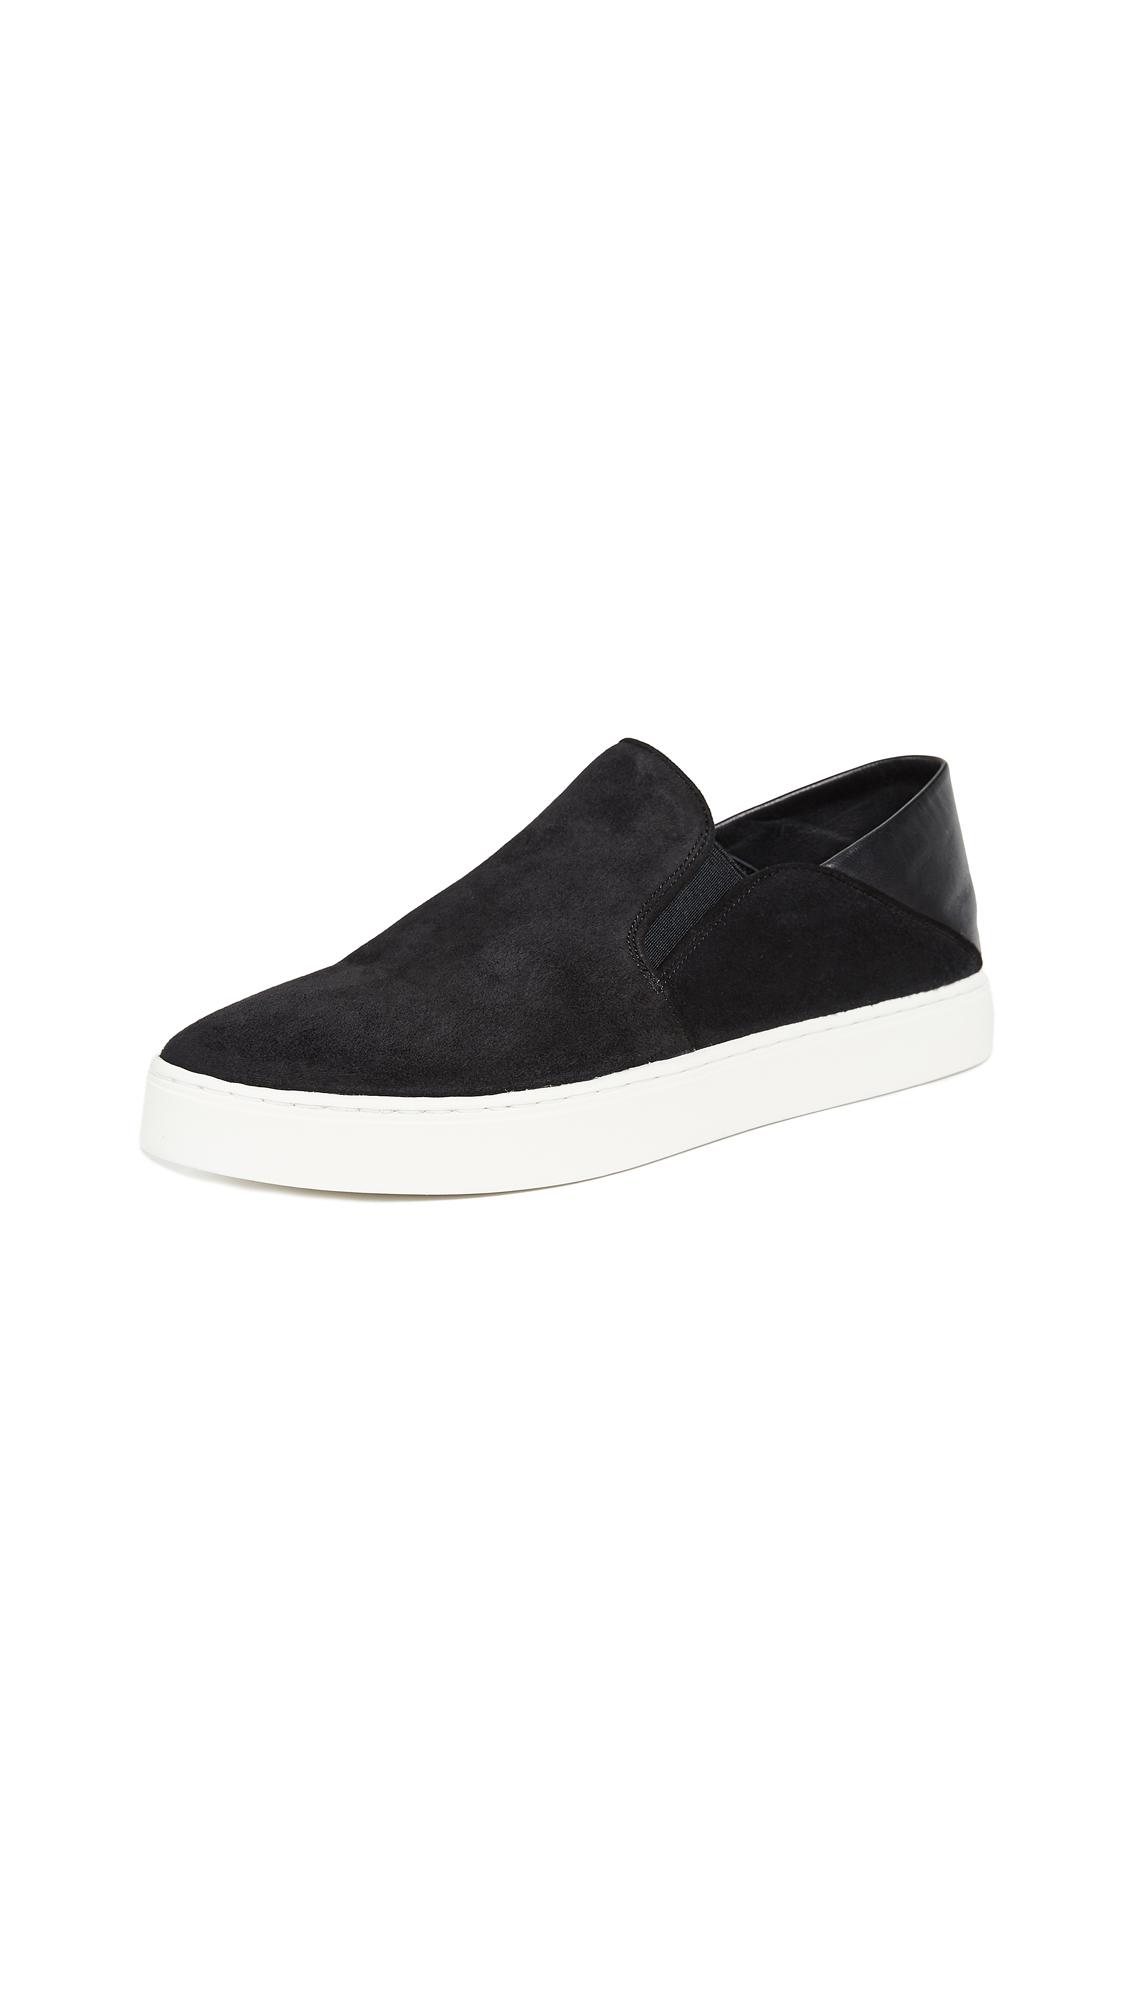 VINCE Women'S Garvey Round Toe Slip-On Suede & Leather Sneakers in Black